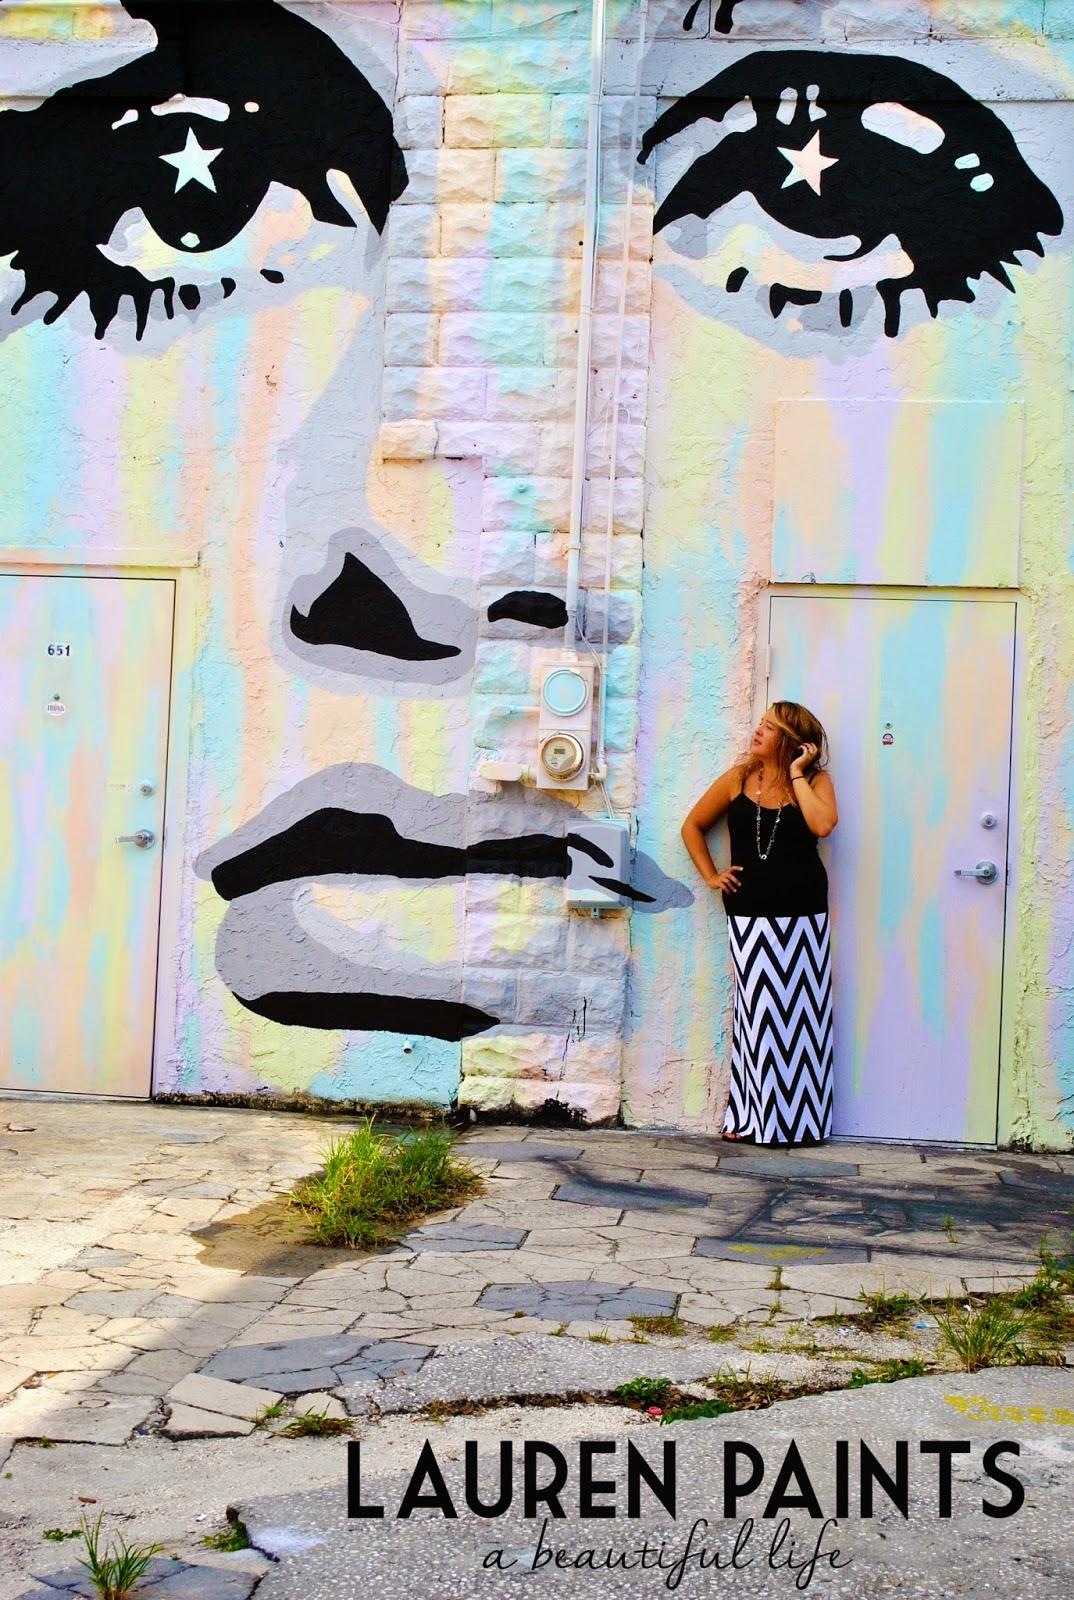 Amazing Twiggy artwork - Downtown St Petersburg Florida street art